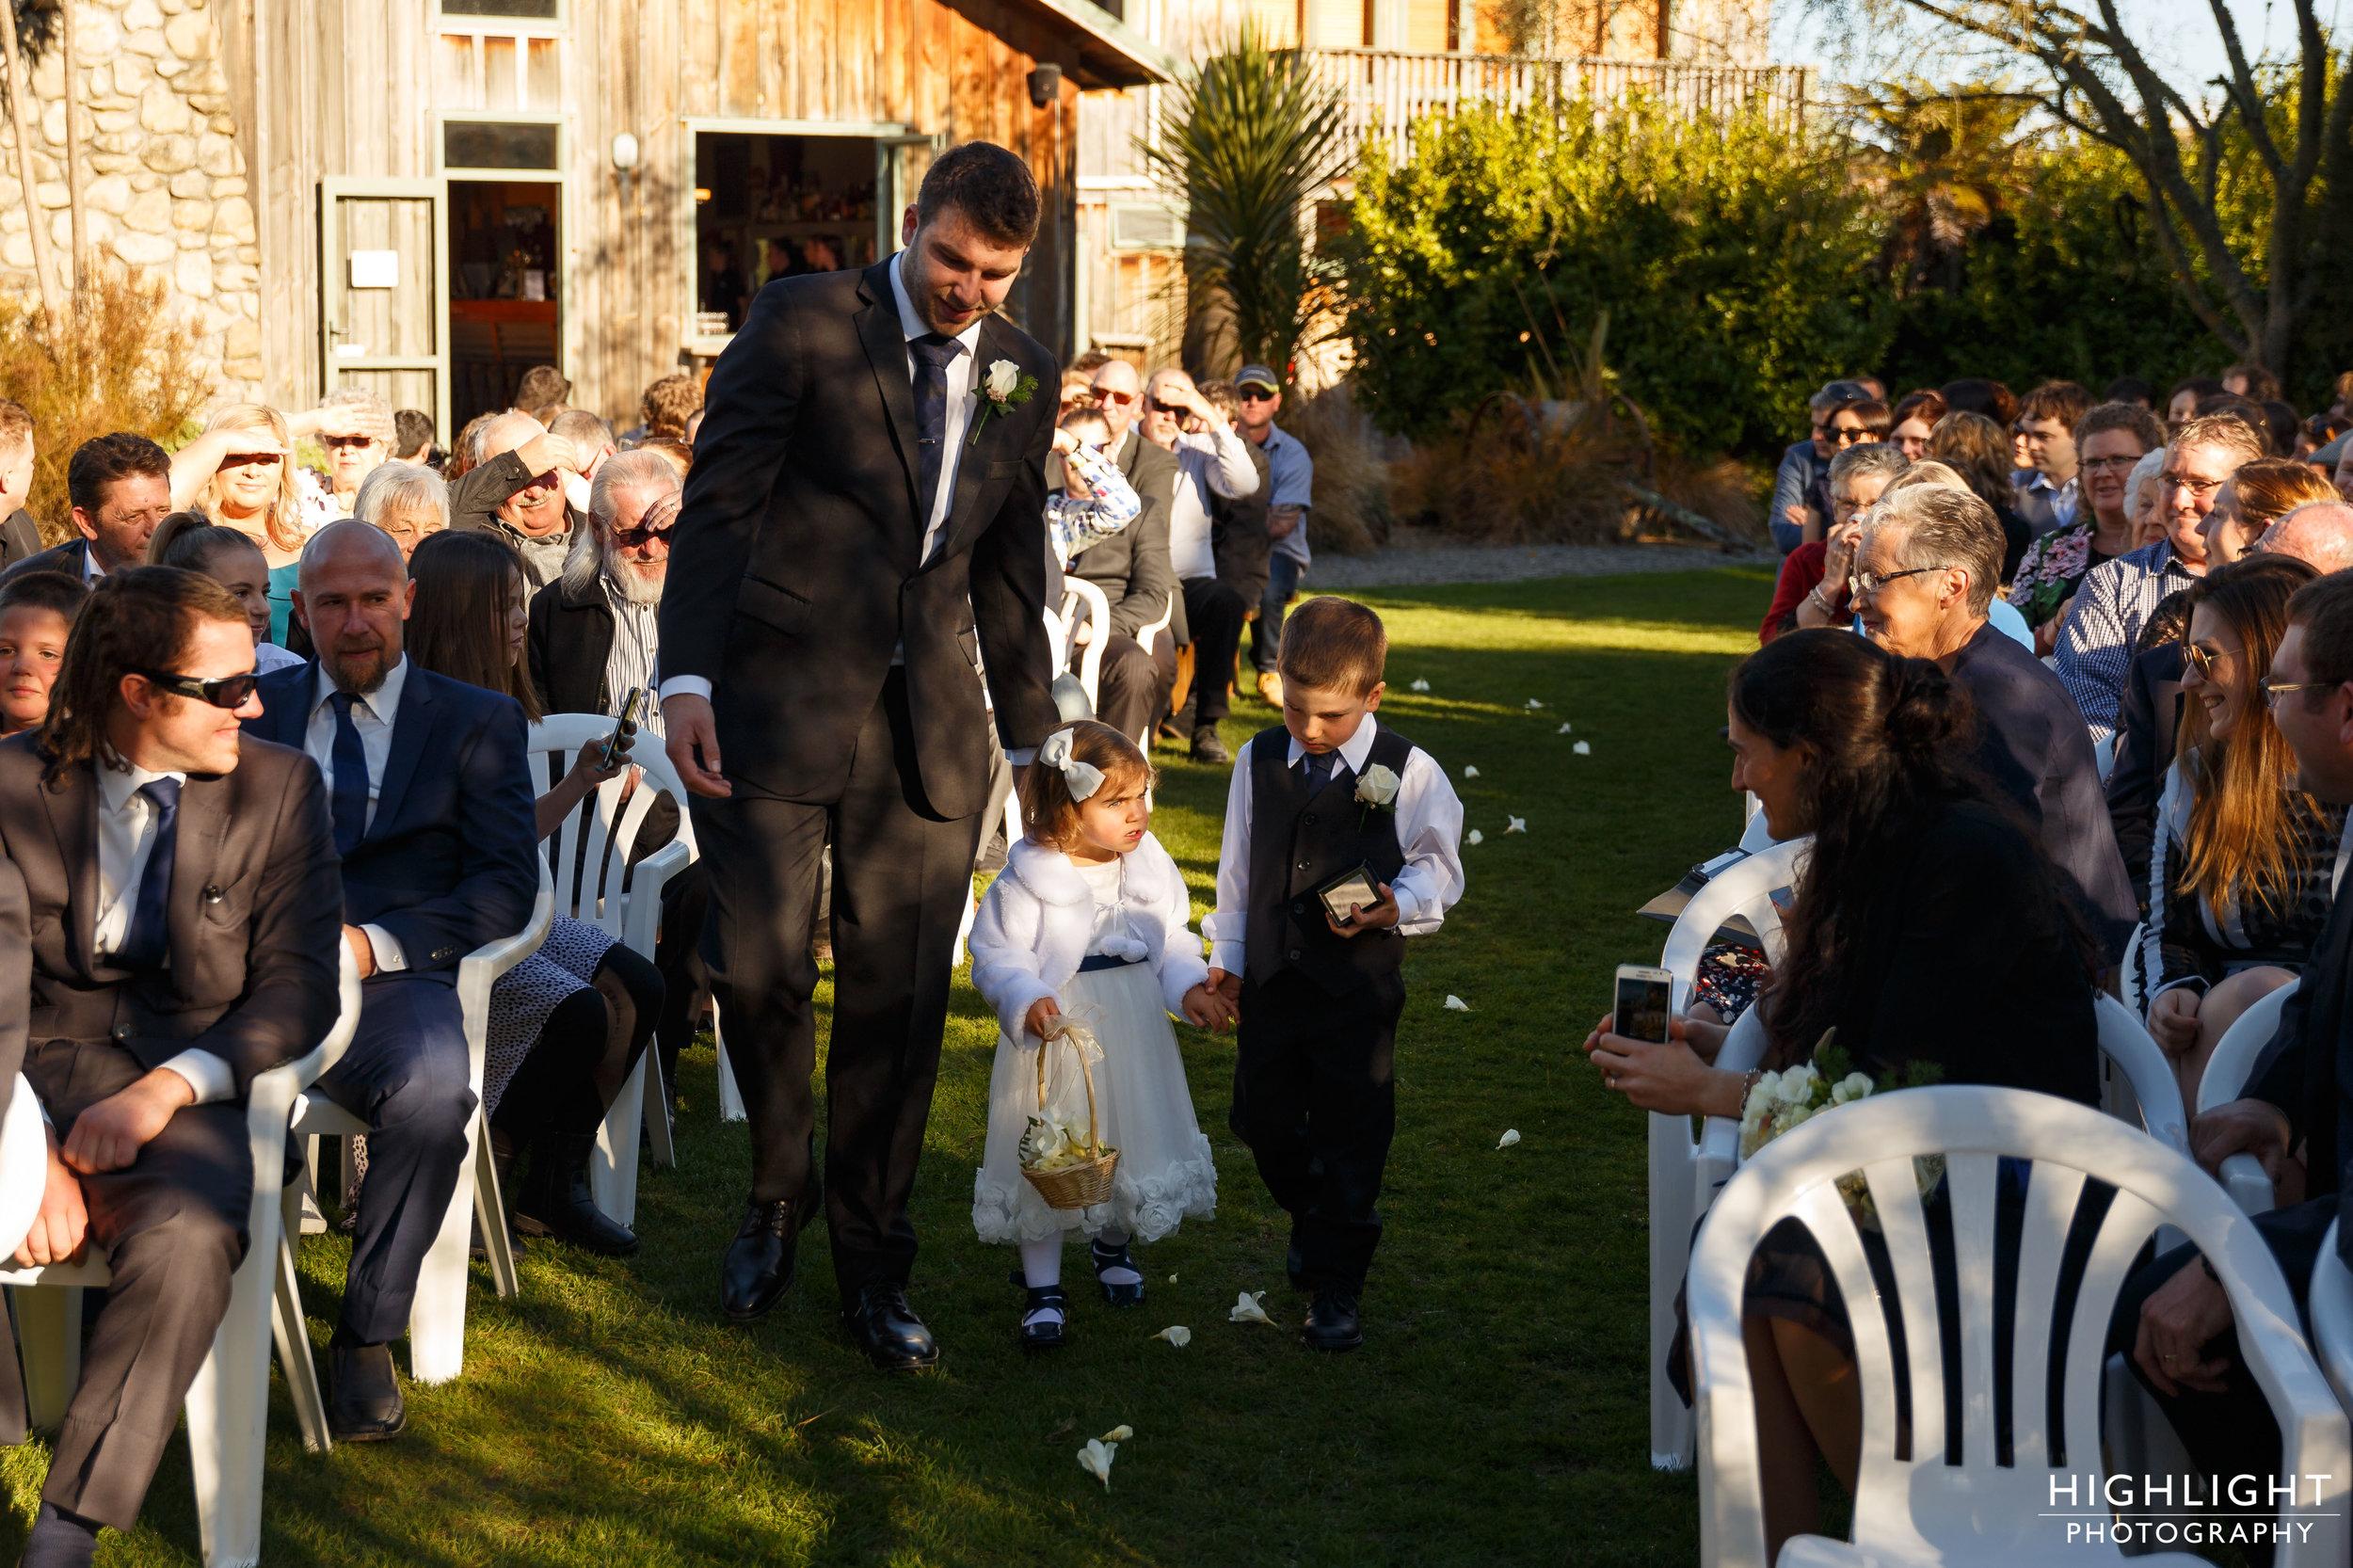 makoura-wedding-photography-highlight-new-zealand-26.jpg